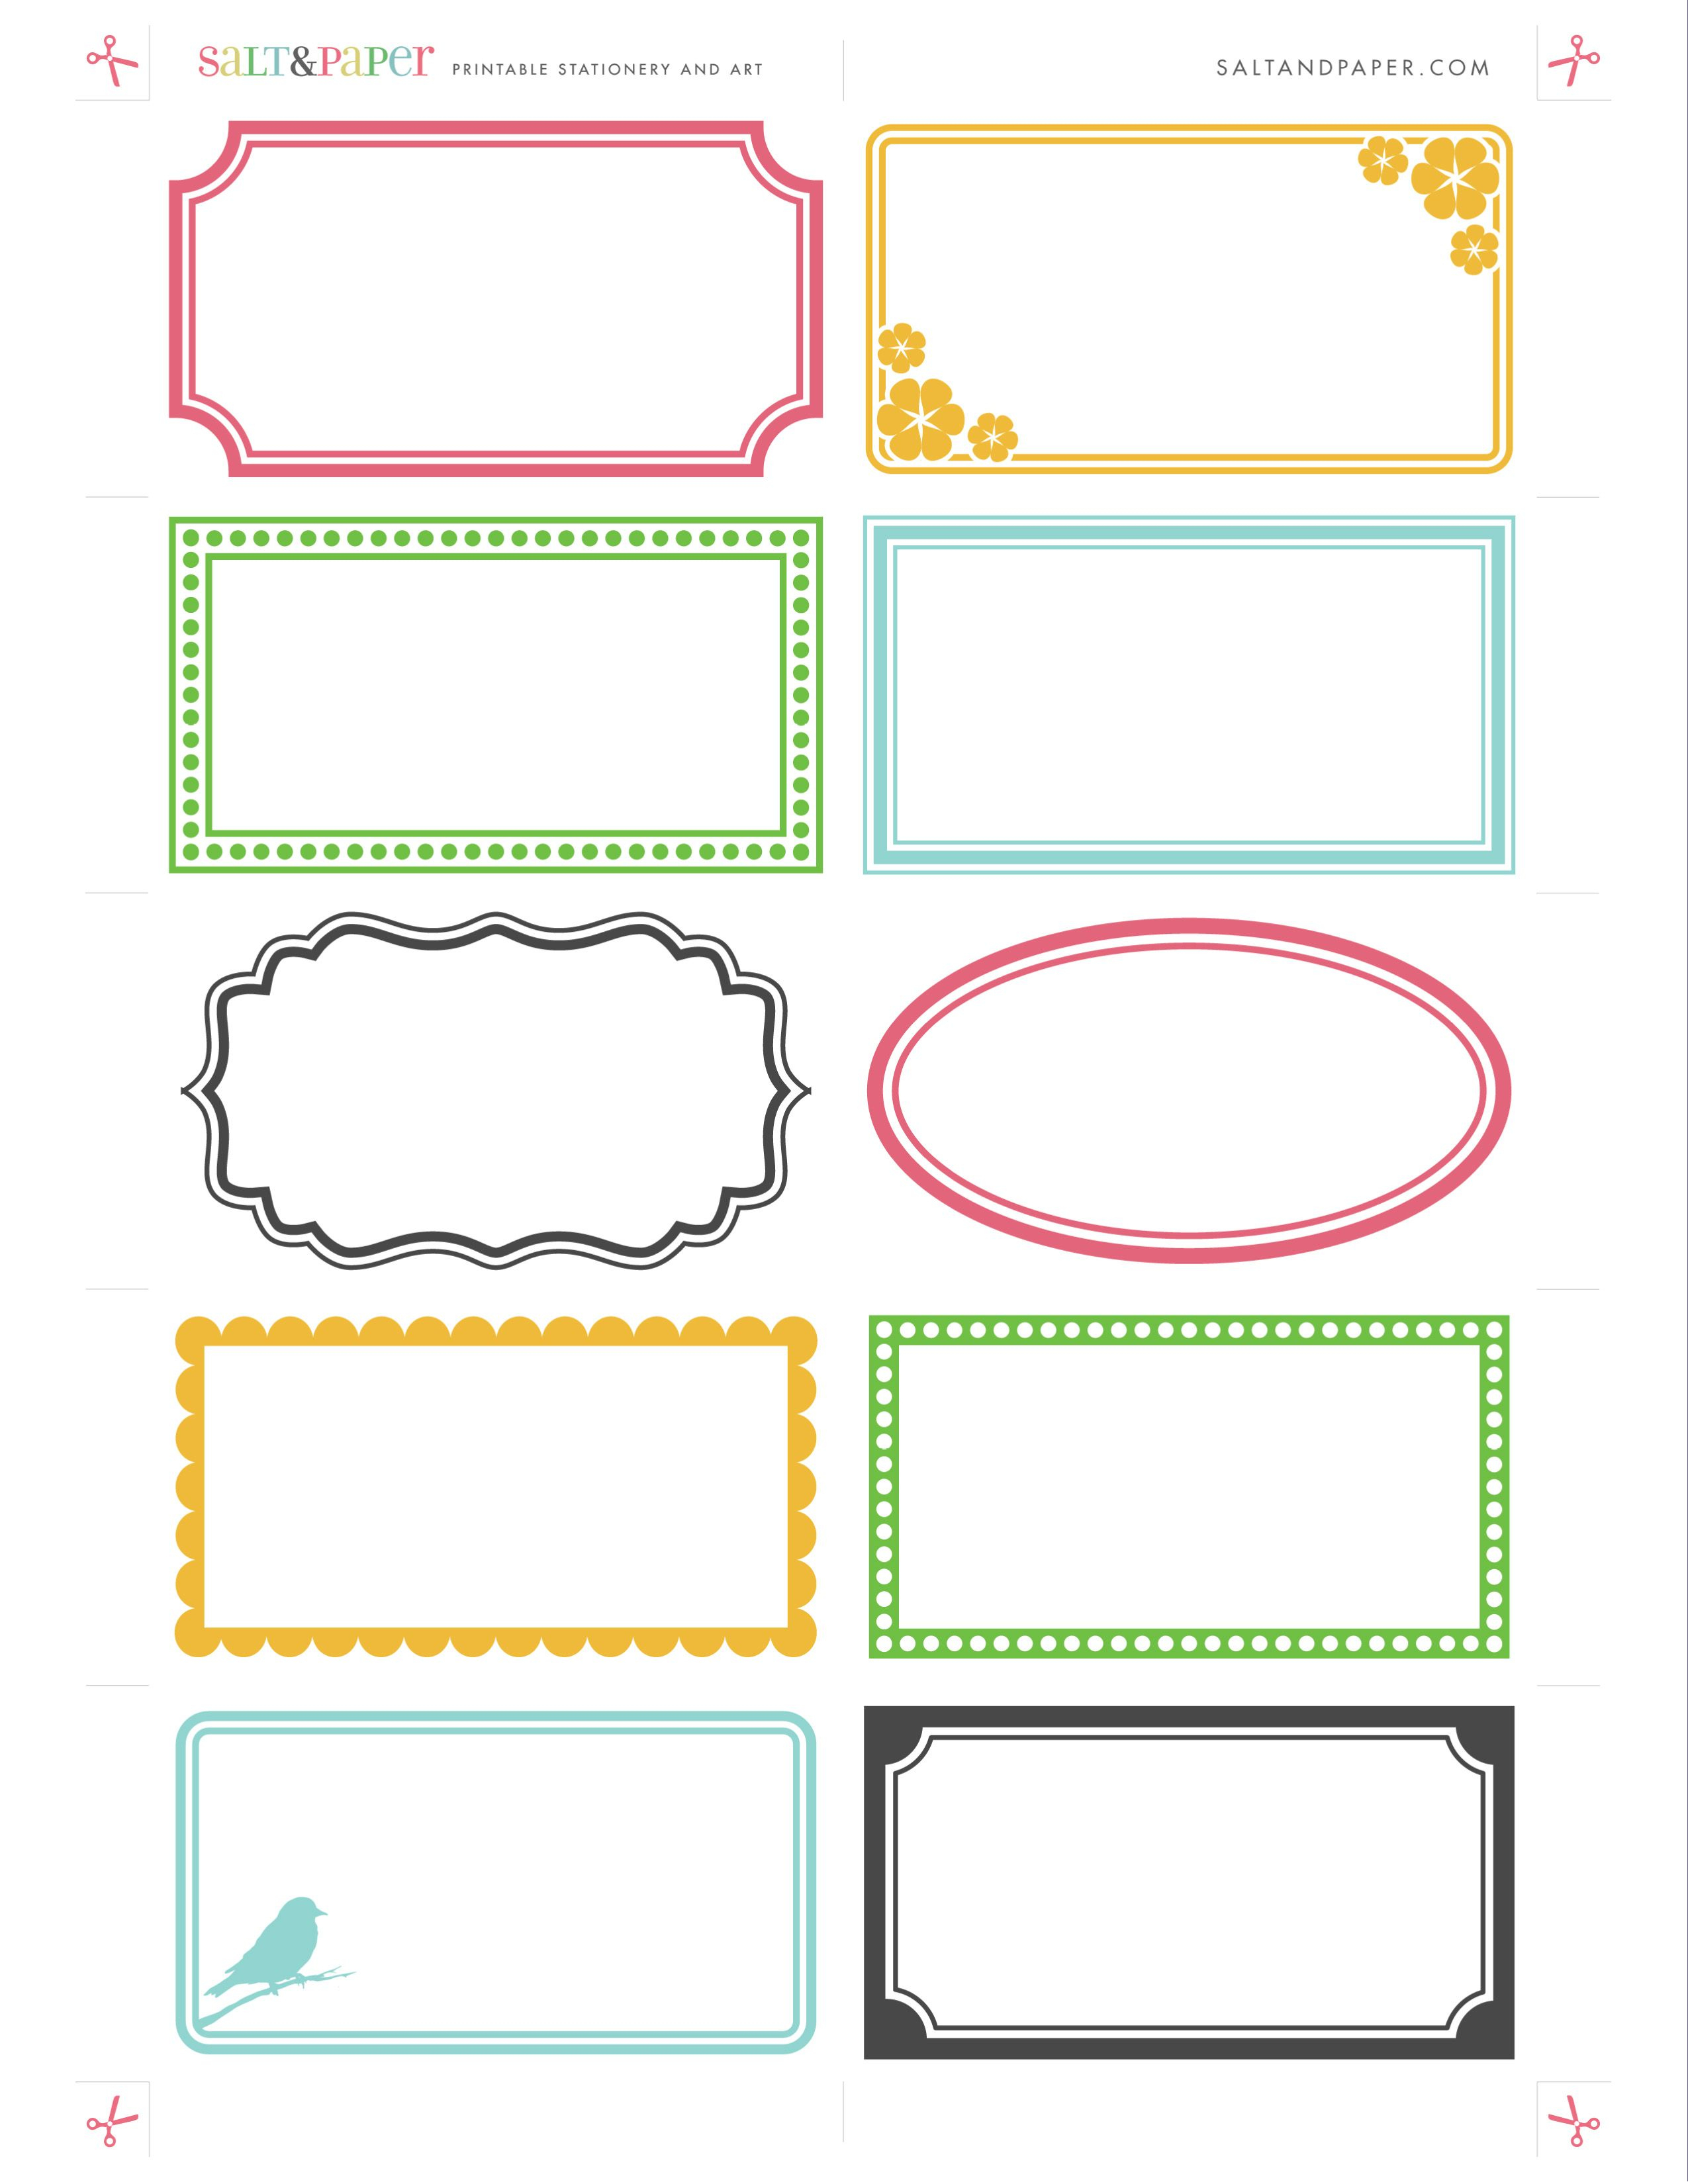 006 Template Ideas Free Printable Label ~ Ulyssesroom - Free Printable Labels Avery 5160